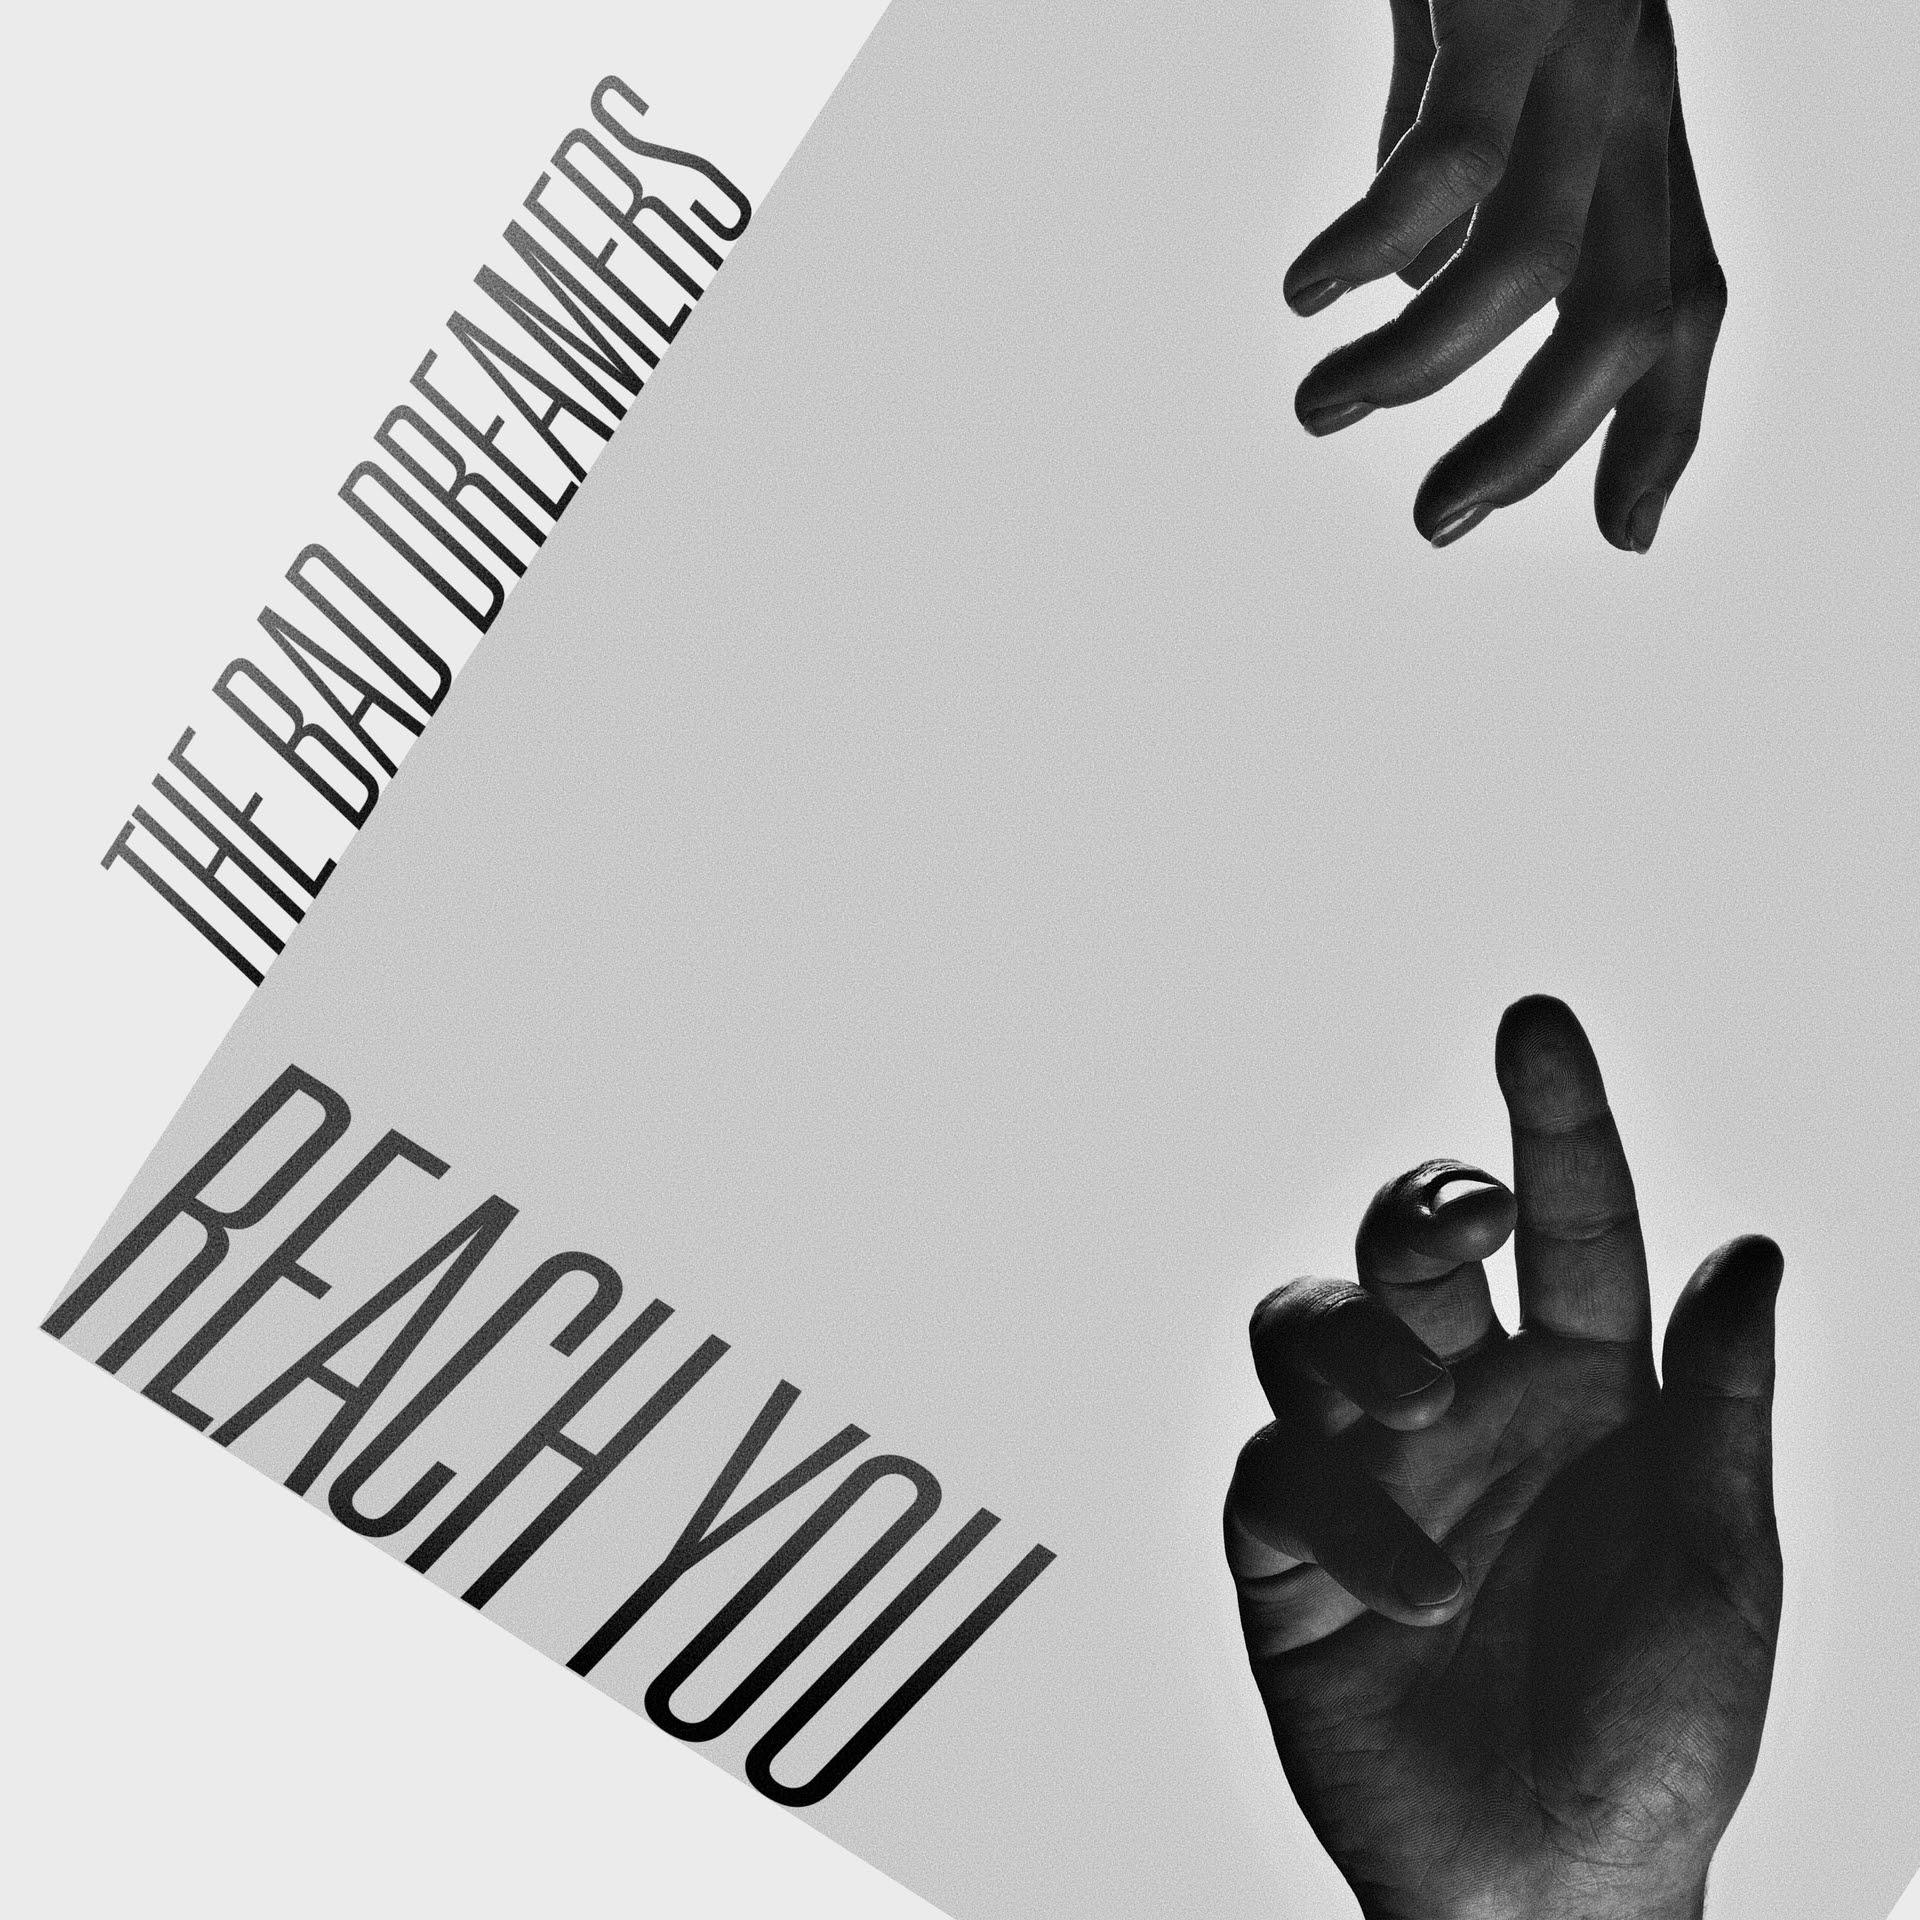 The-Bad-Dreamers-Reach-You.jpg